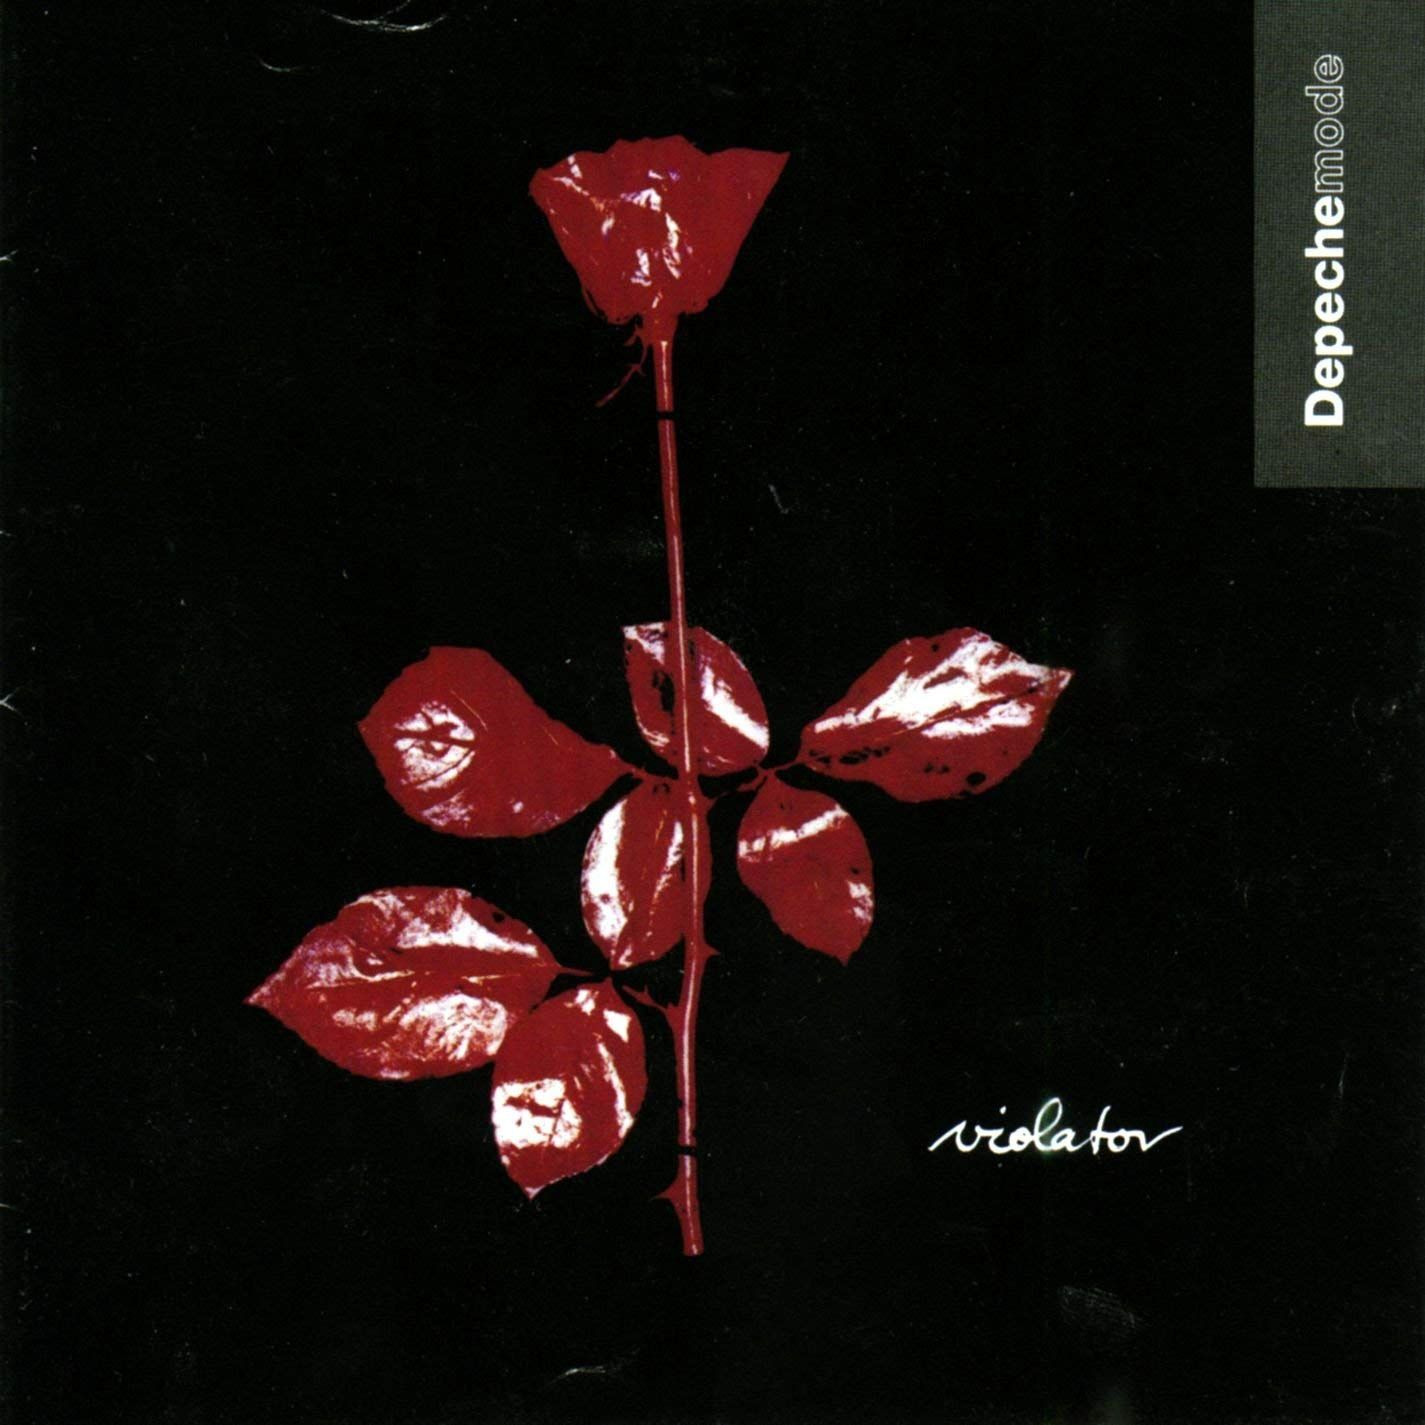 Depeche Mode Violator Google Search Depeche Mode Disfruta Del Silencio Portadas De Discos